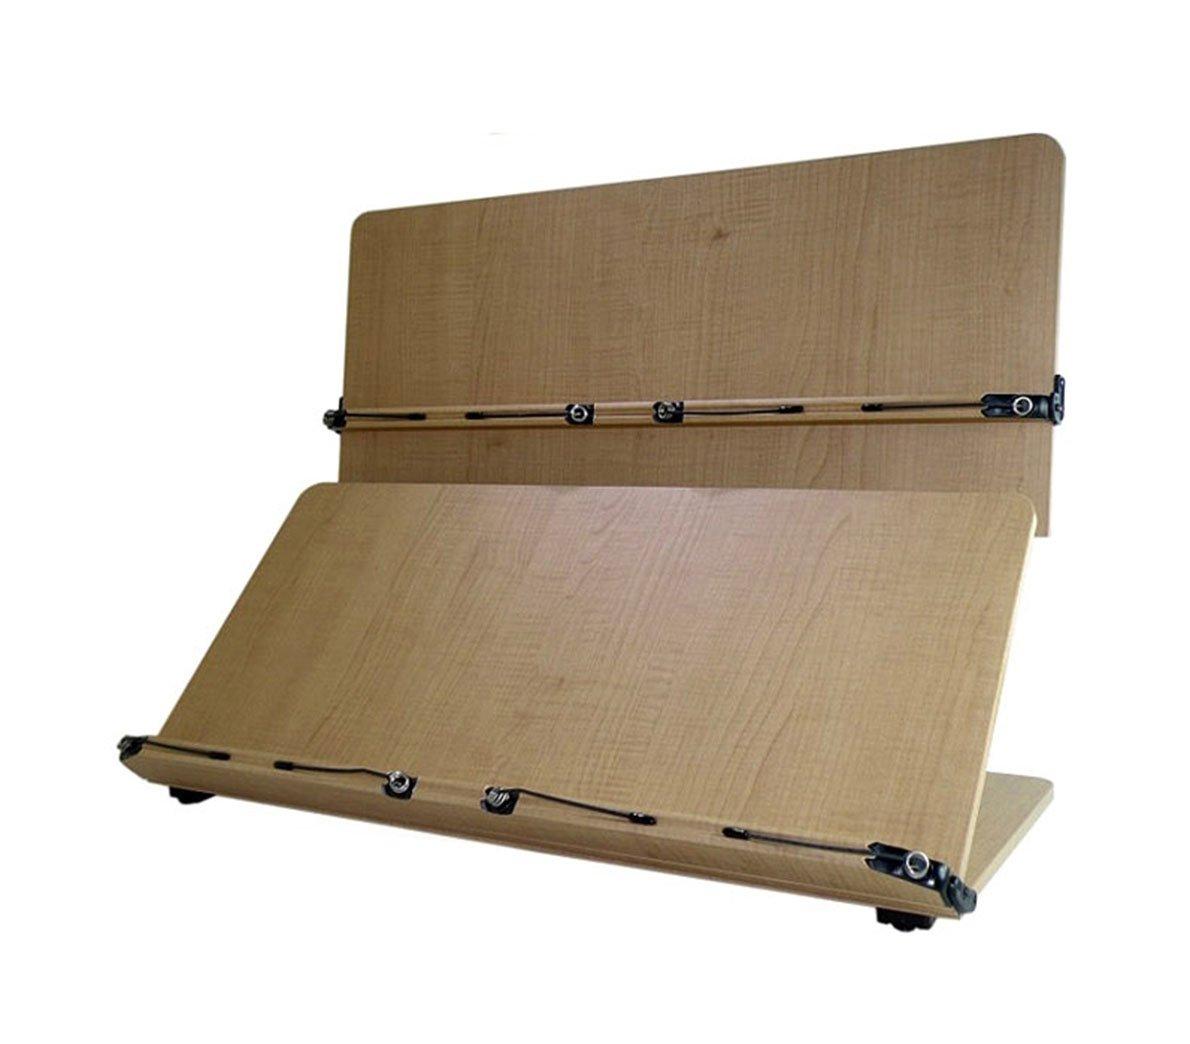 Book Stand Holder Reading Desk Desktop Book Stands Office Supplies 2nd Stage Wood MDF W 23.8''